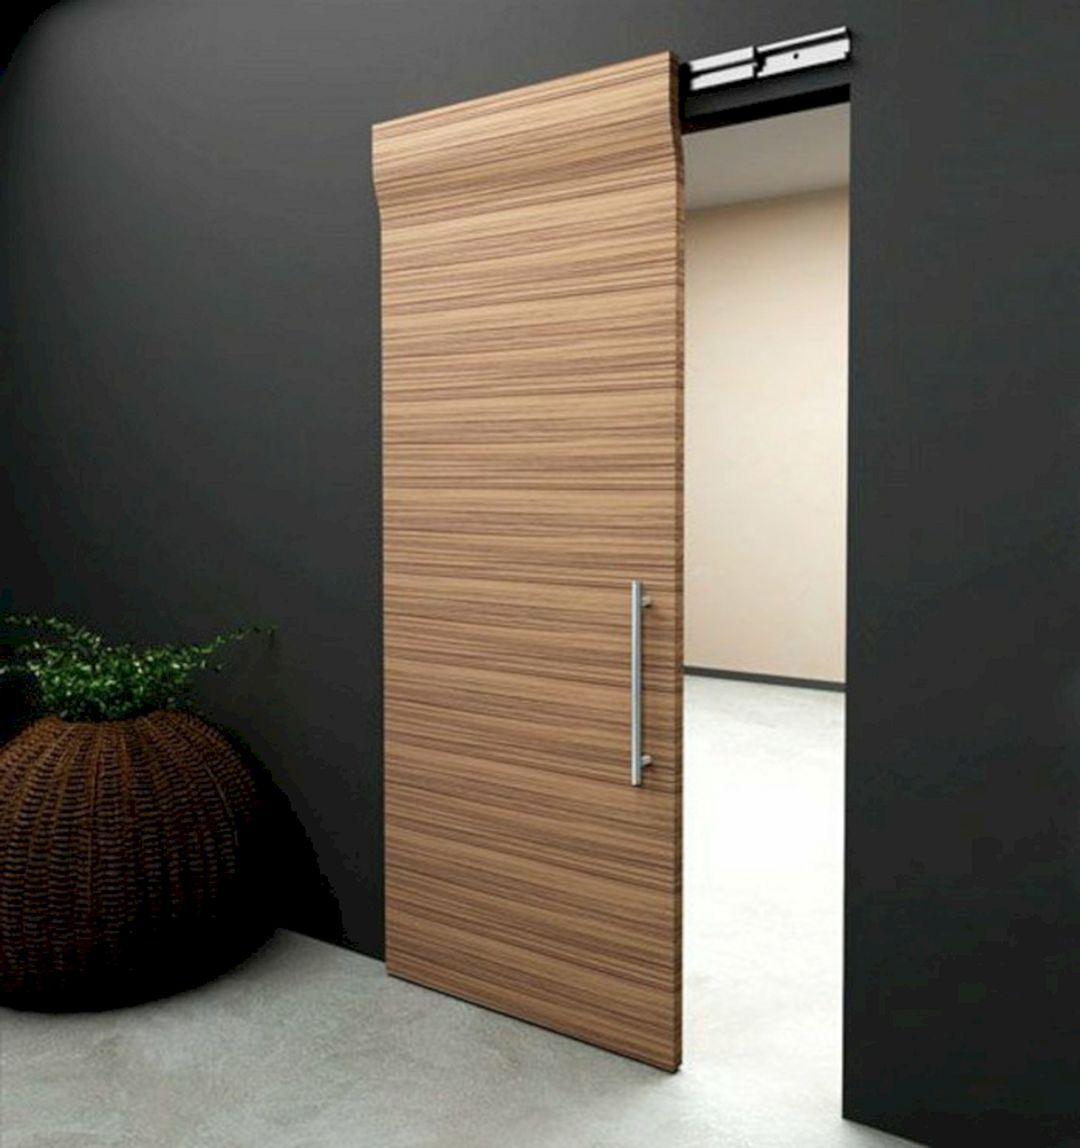 12 Modern Sliding Door Ideas That Make A Amzing Home Freshouz Com Doors Interior Modern Door Design Modern Sliding Door Design